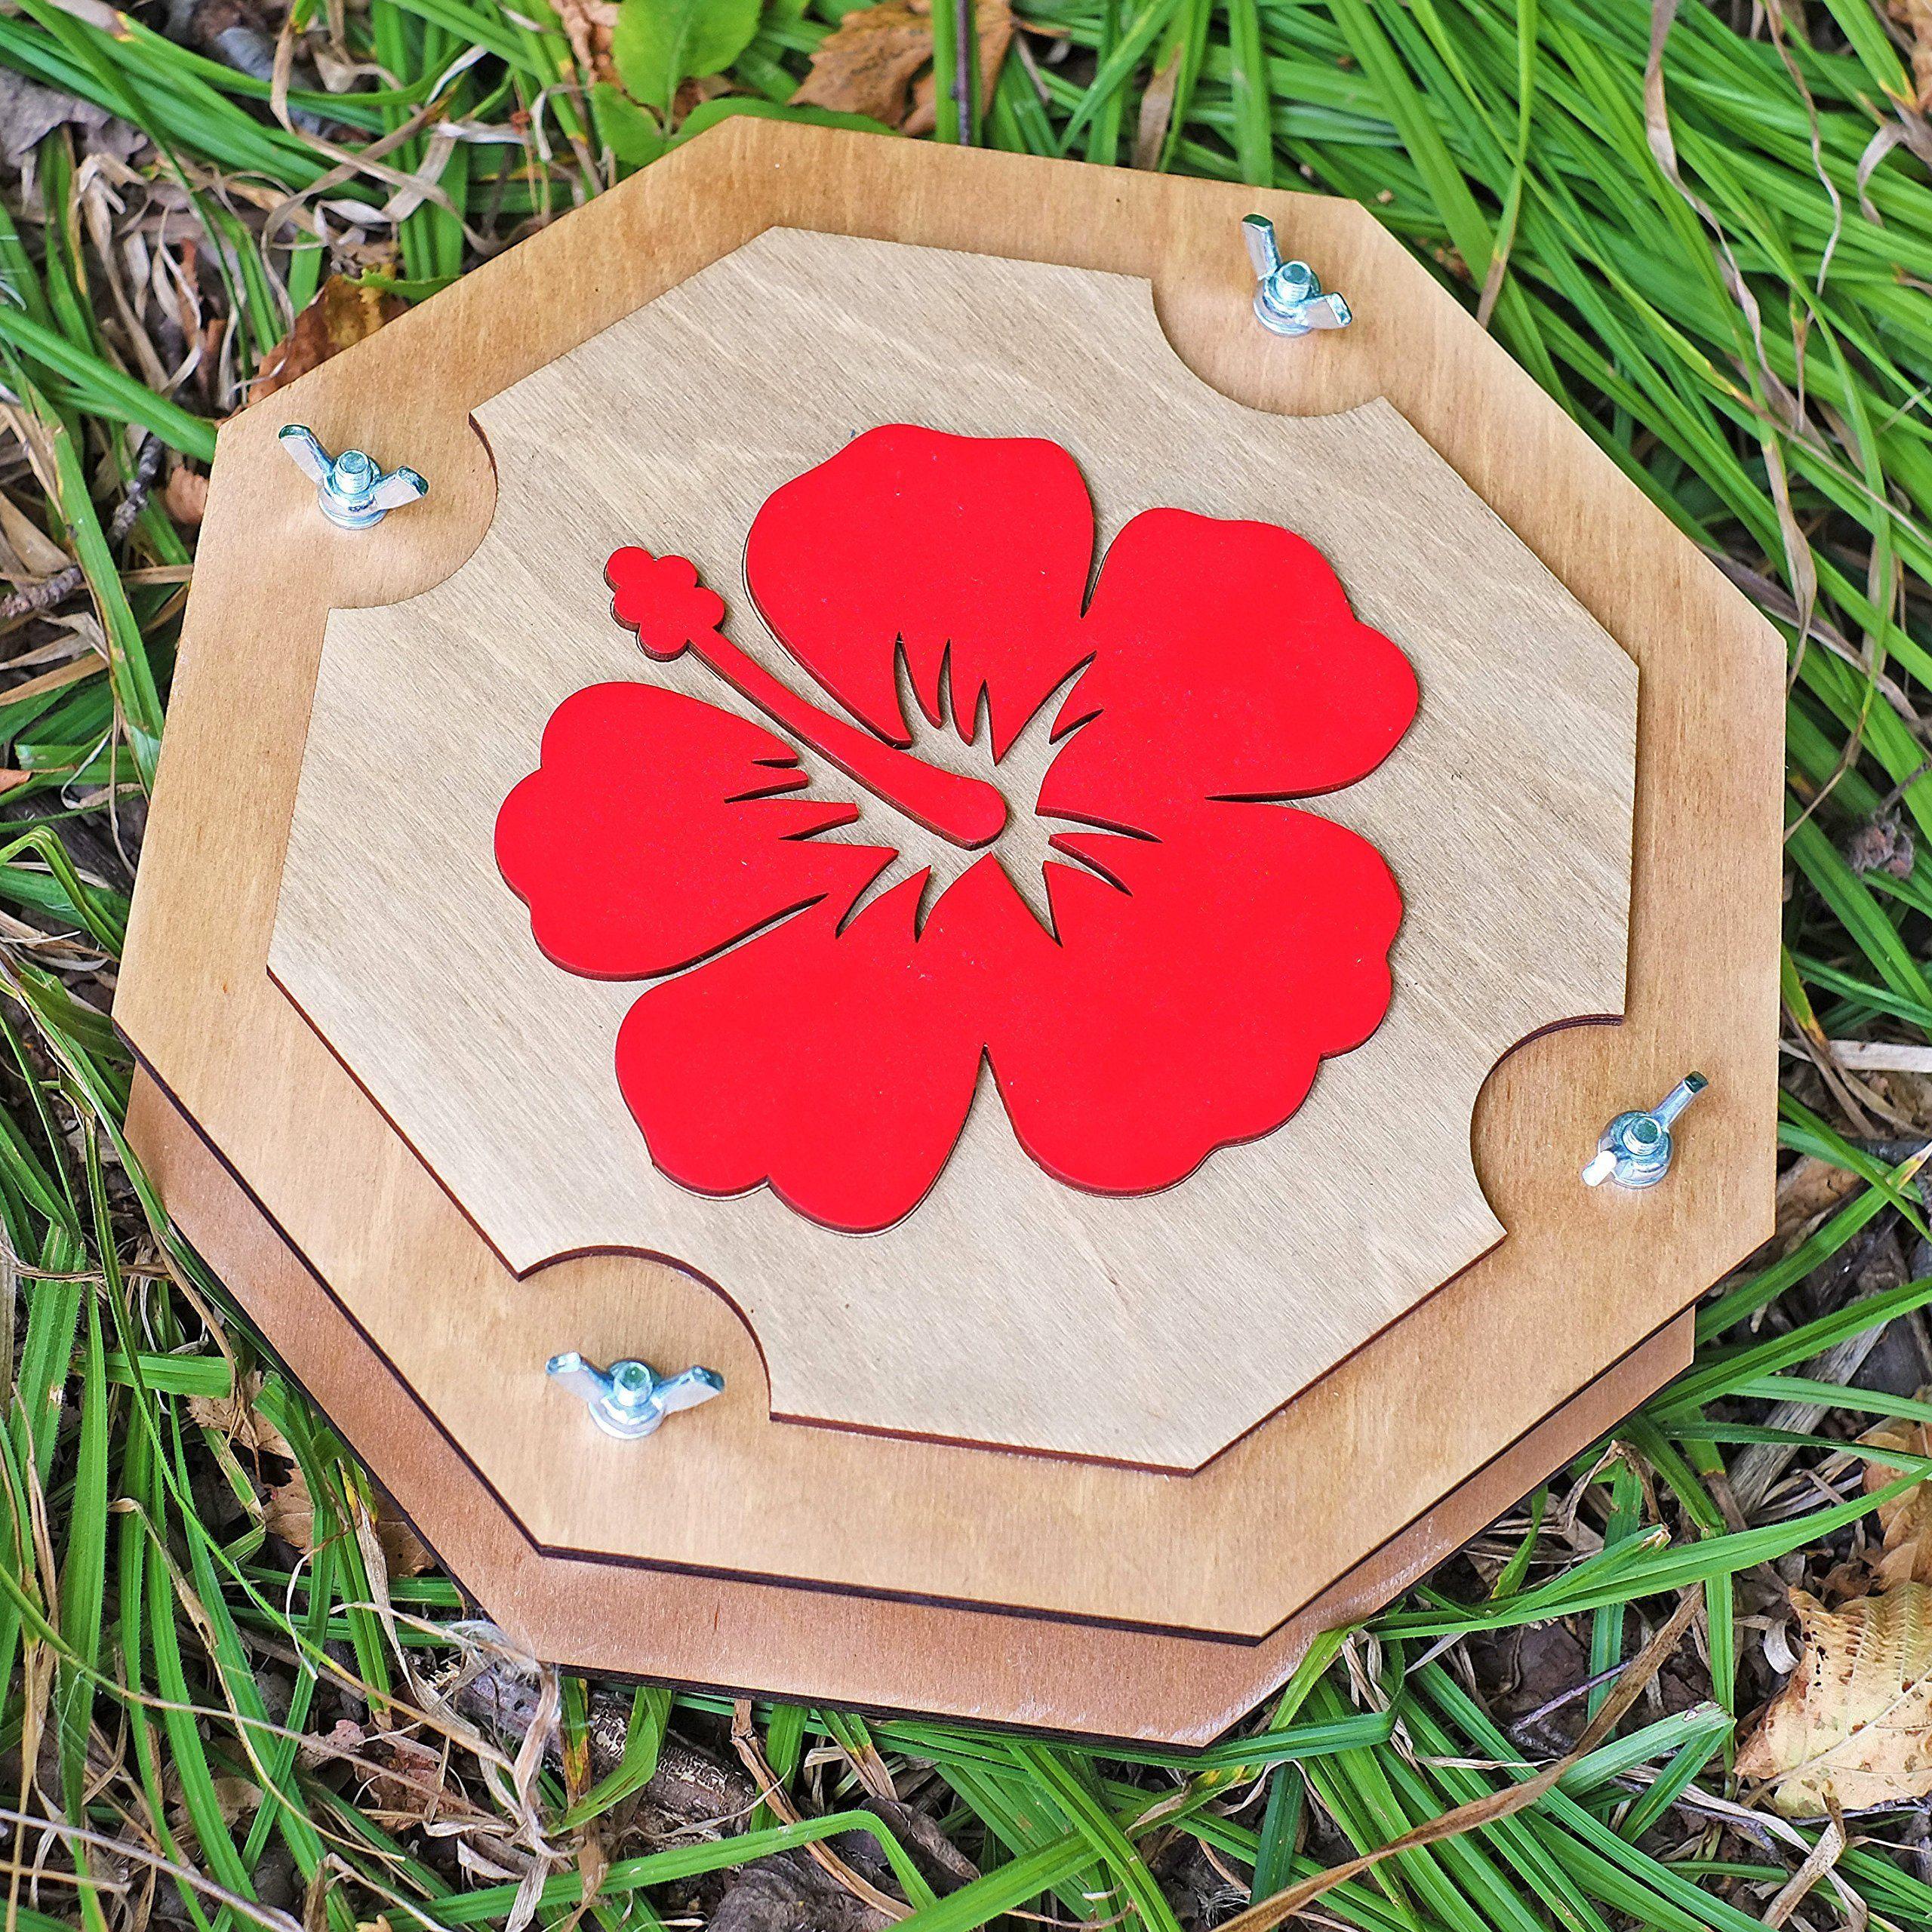 Hawaiian Red Hibiscus Big Botanical Flower Leaf Press For Herbarium